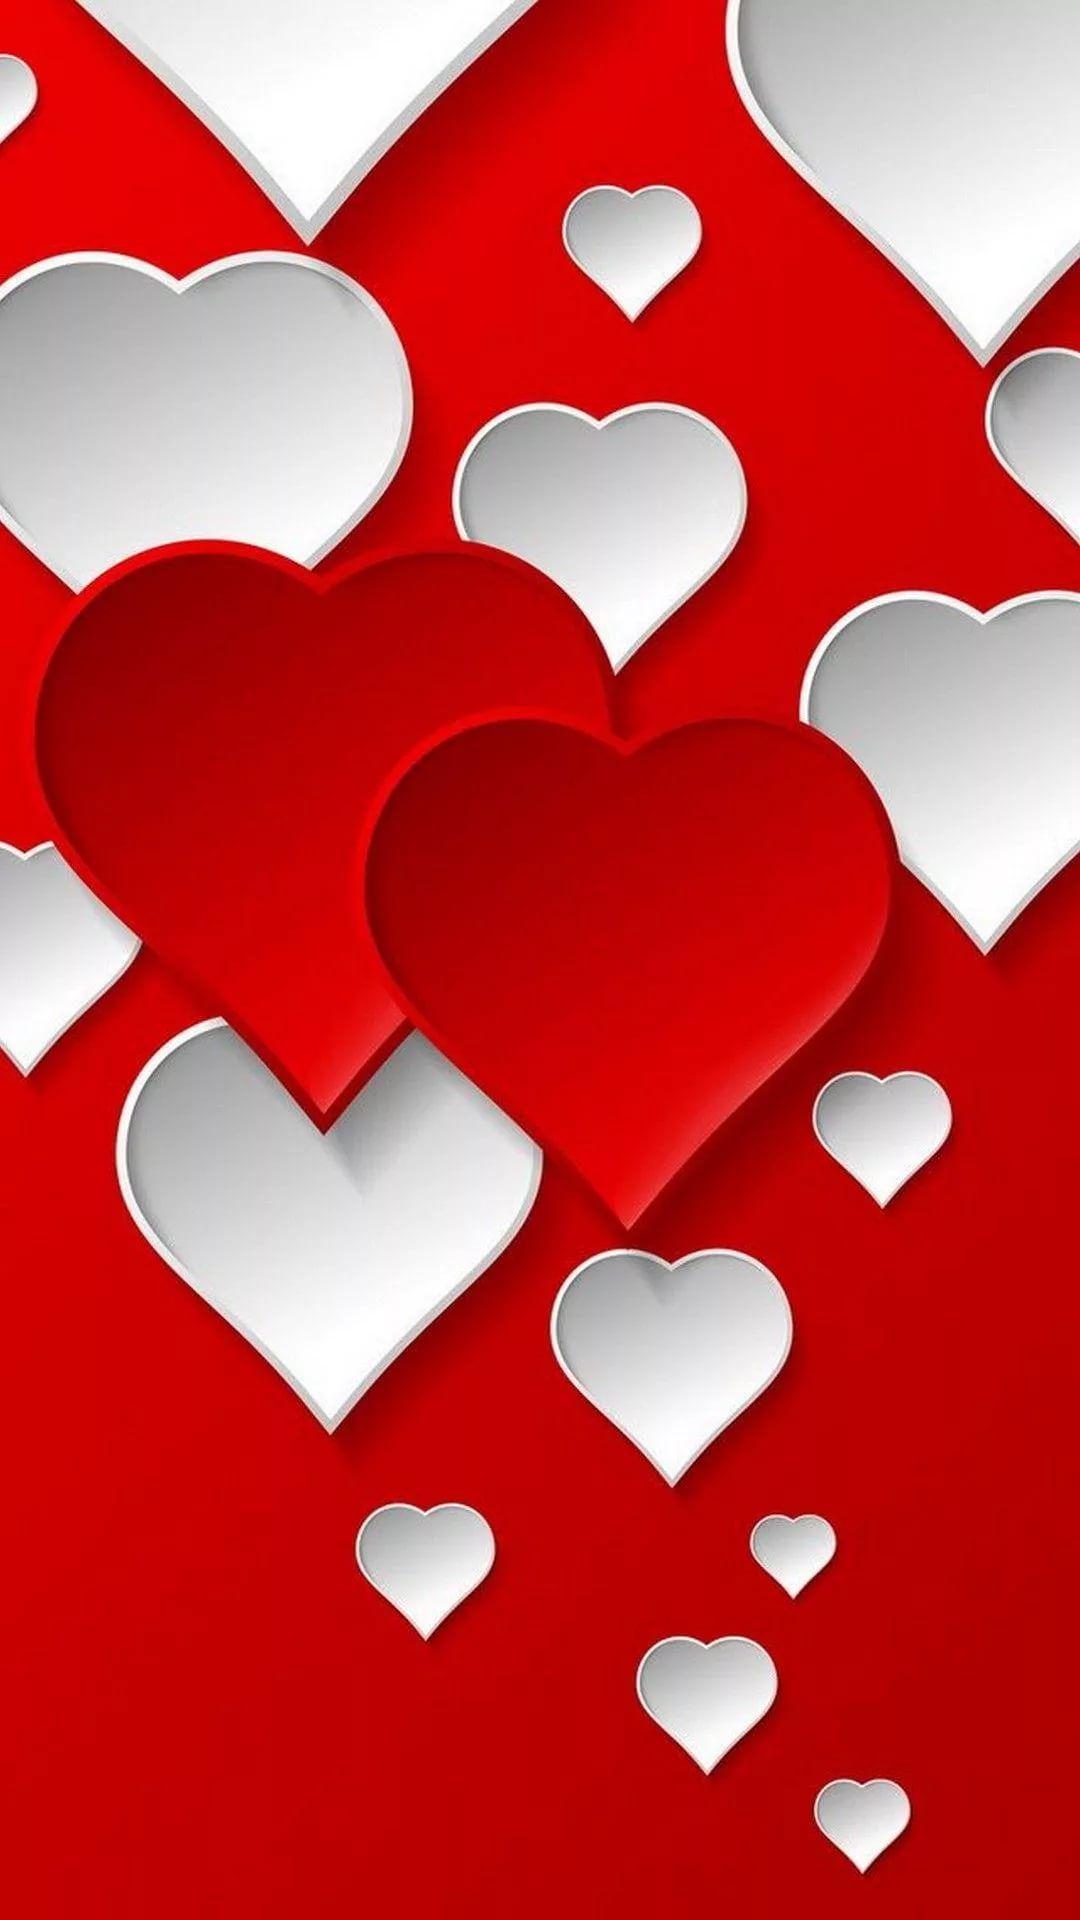 Valentine's Day phone background